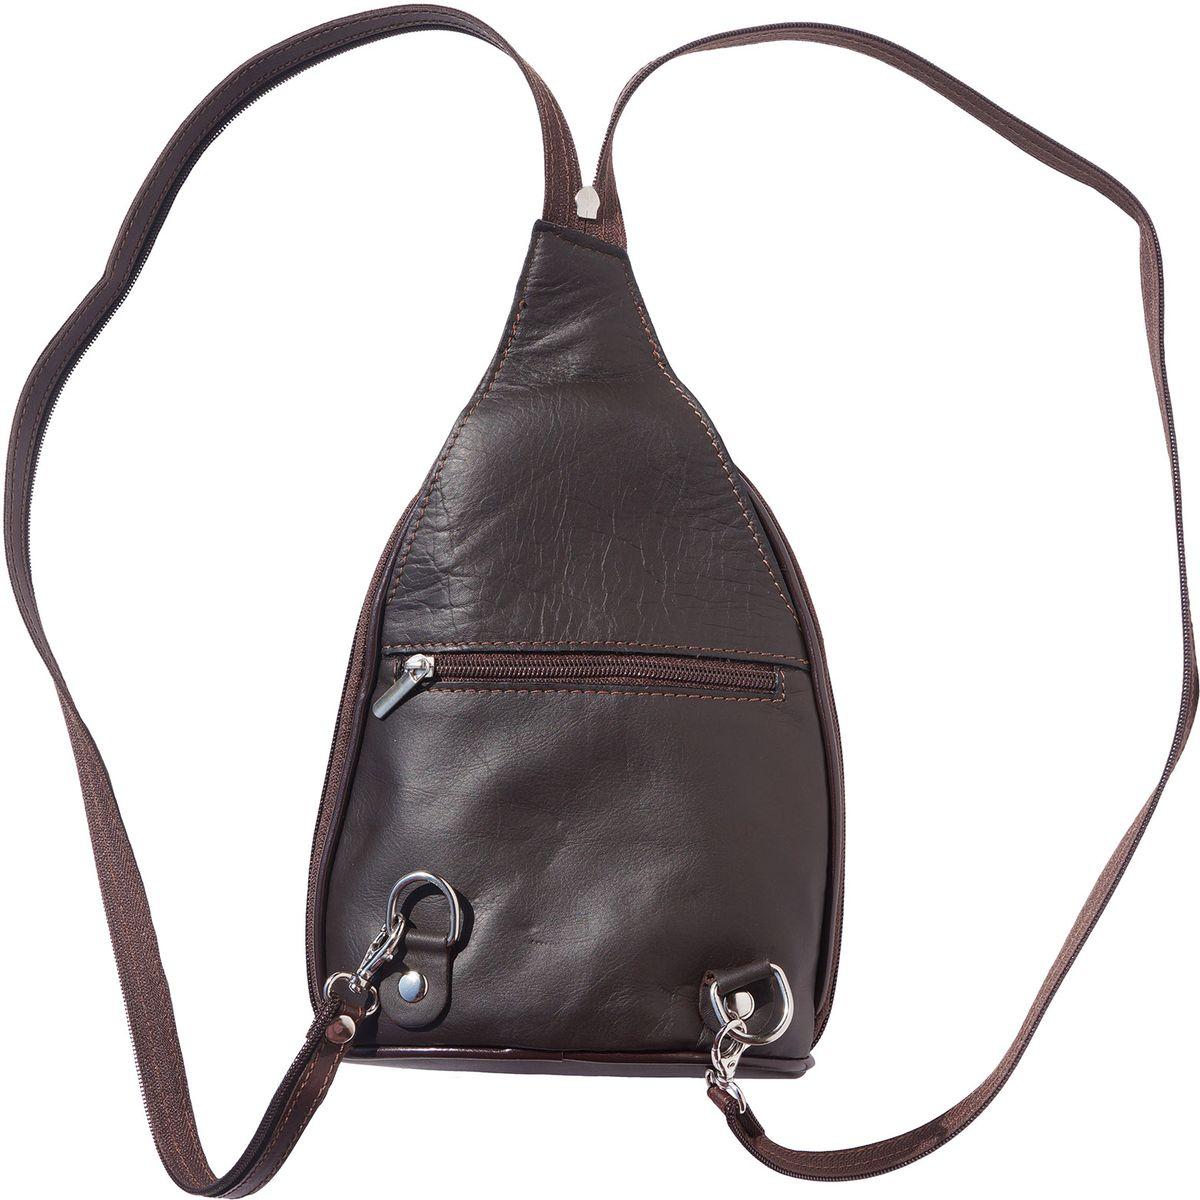 2f771842b5 ... Δερμάτινη Τσάντα Πλάτης Foglia GM Firenze Leather 2060 Σκουρο Καφε ...